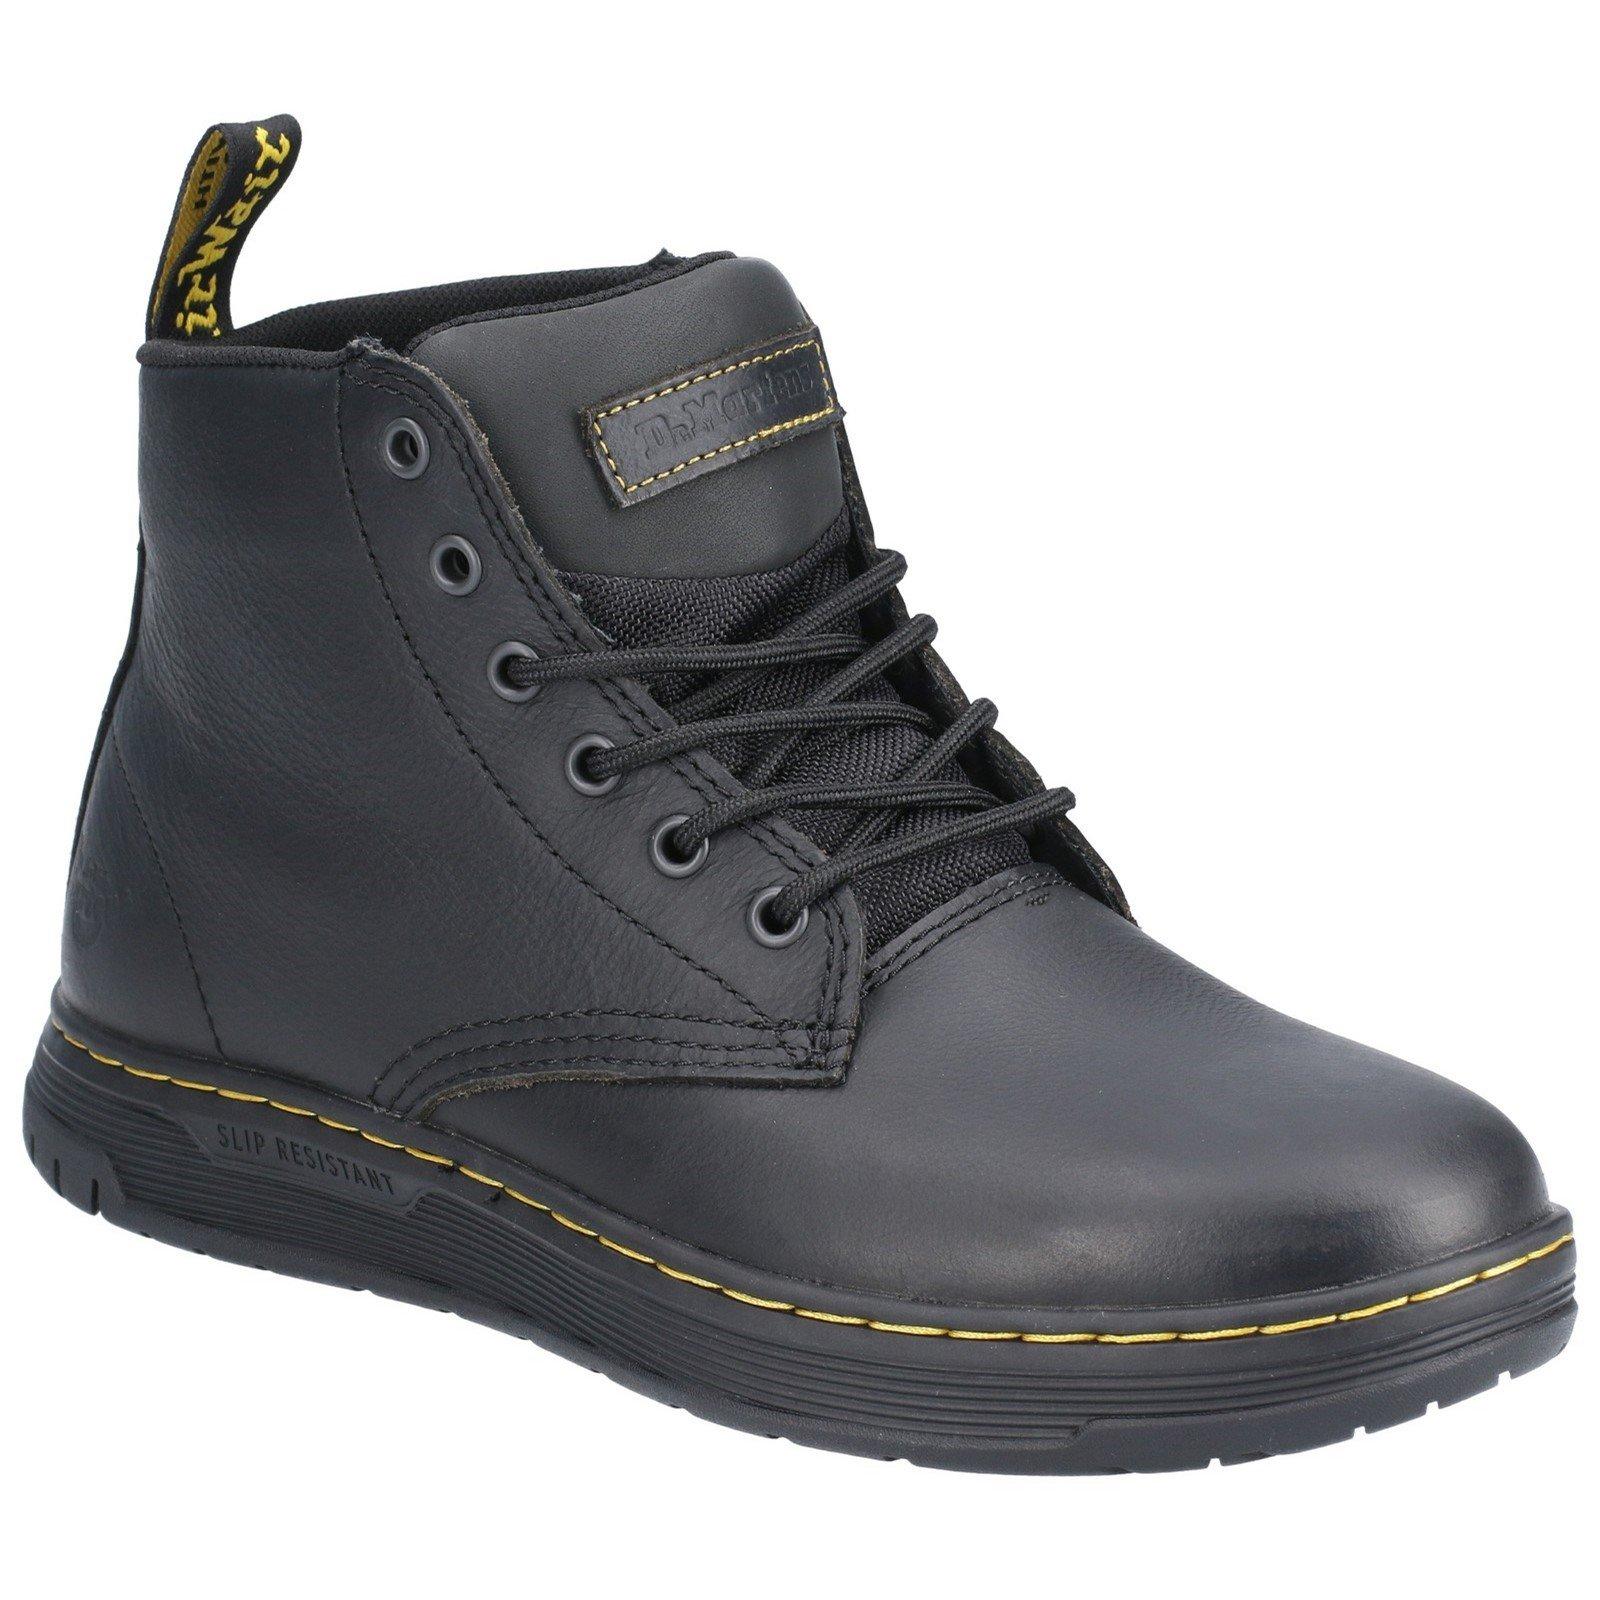 Dr Martens Men's Amwell Slip Resistant Leather Boot Black 29508 - Black 5